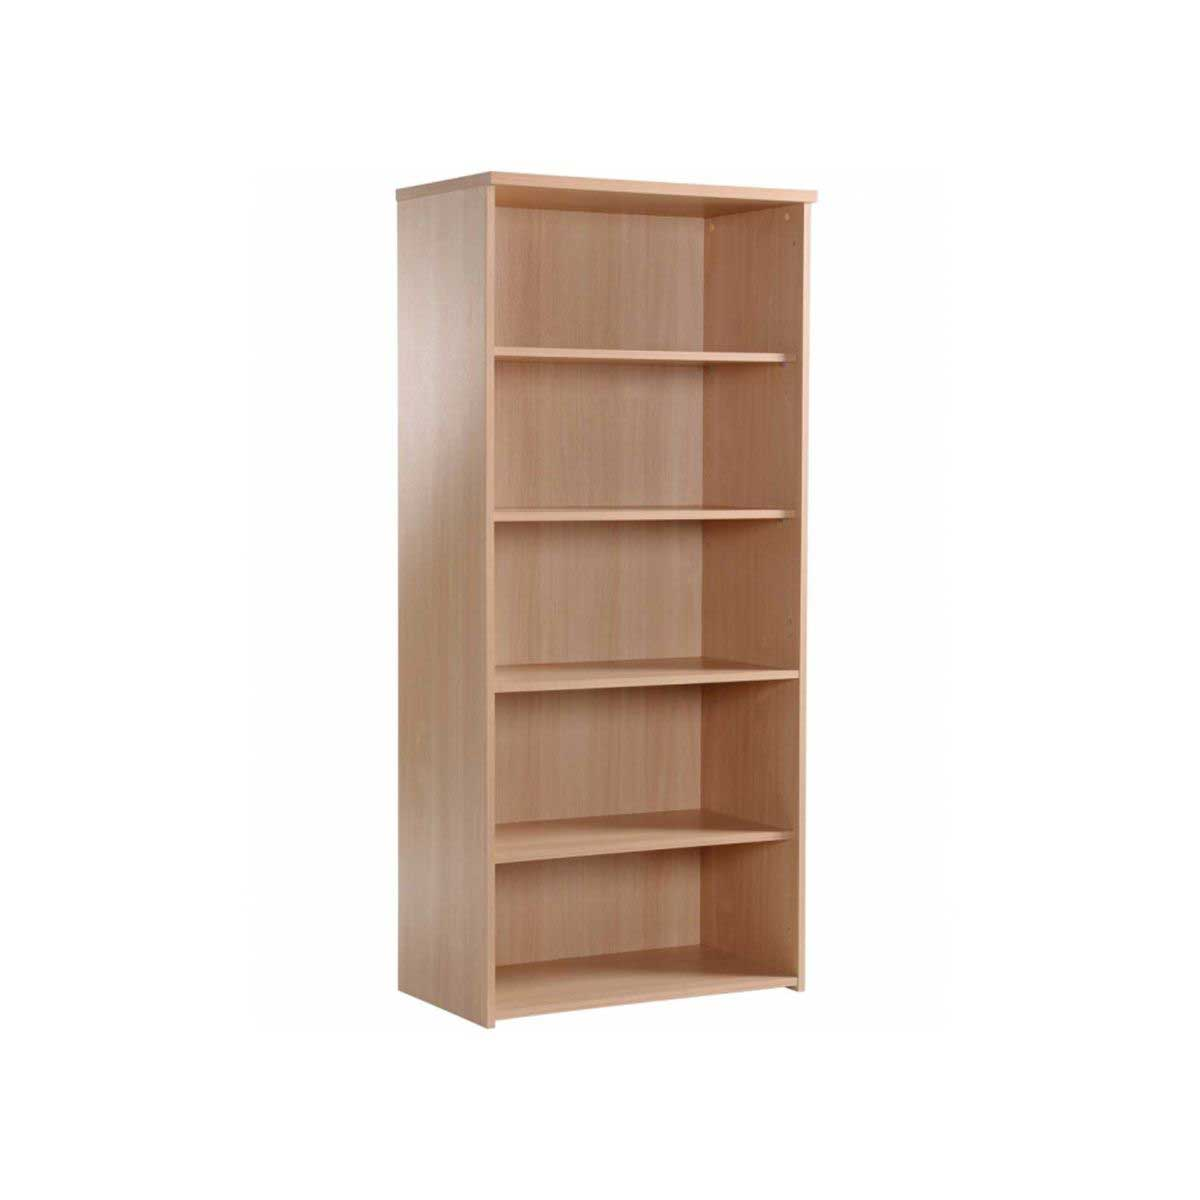 Momento Tall Bookcase 5 Shelf, Woodland Beech